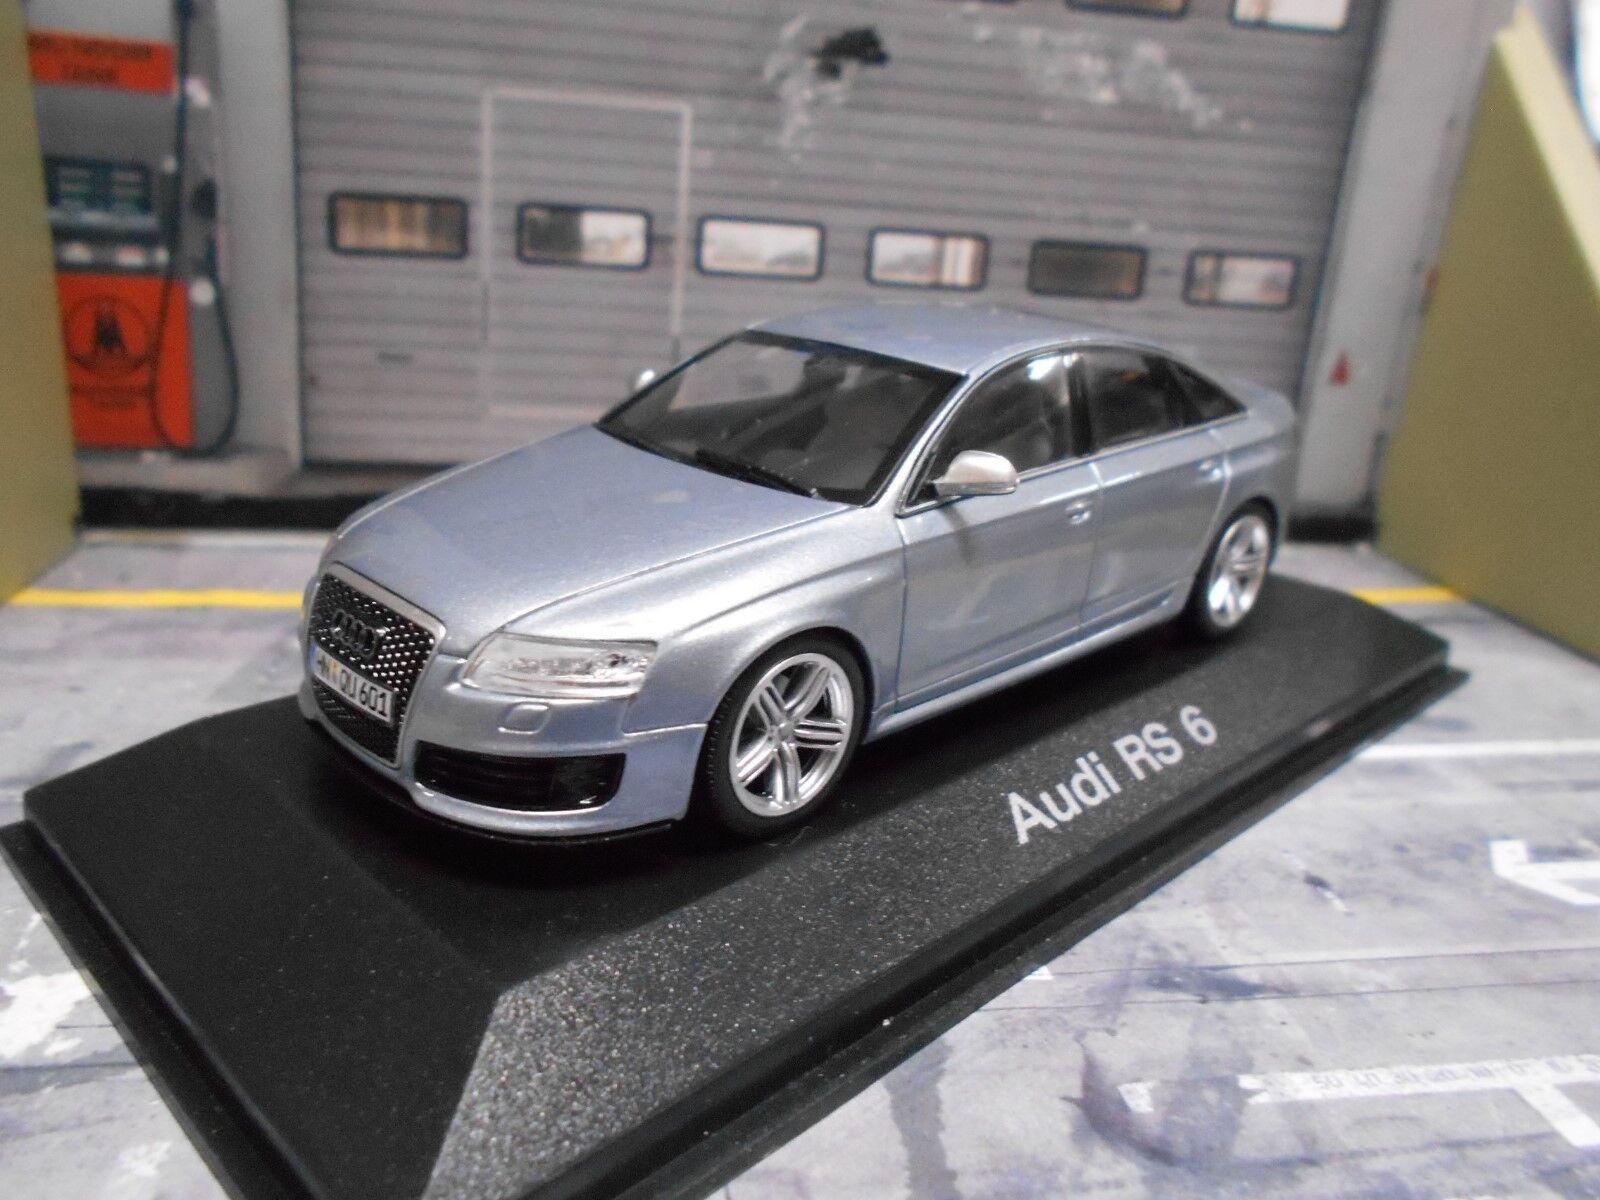 Audi Audi Audi a6 rs6 RS 6 sedán Quattro MKII 2008 - 2010 silb Minichamps traficantes 1 43 955ab3